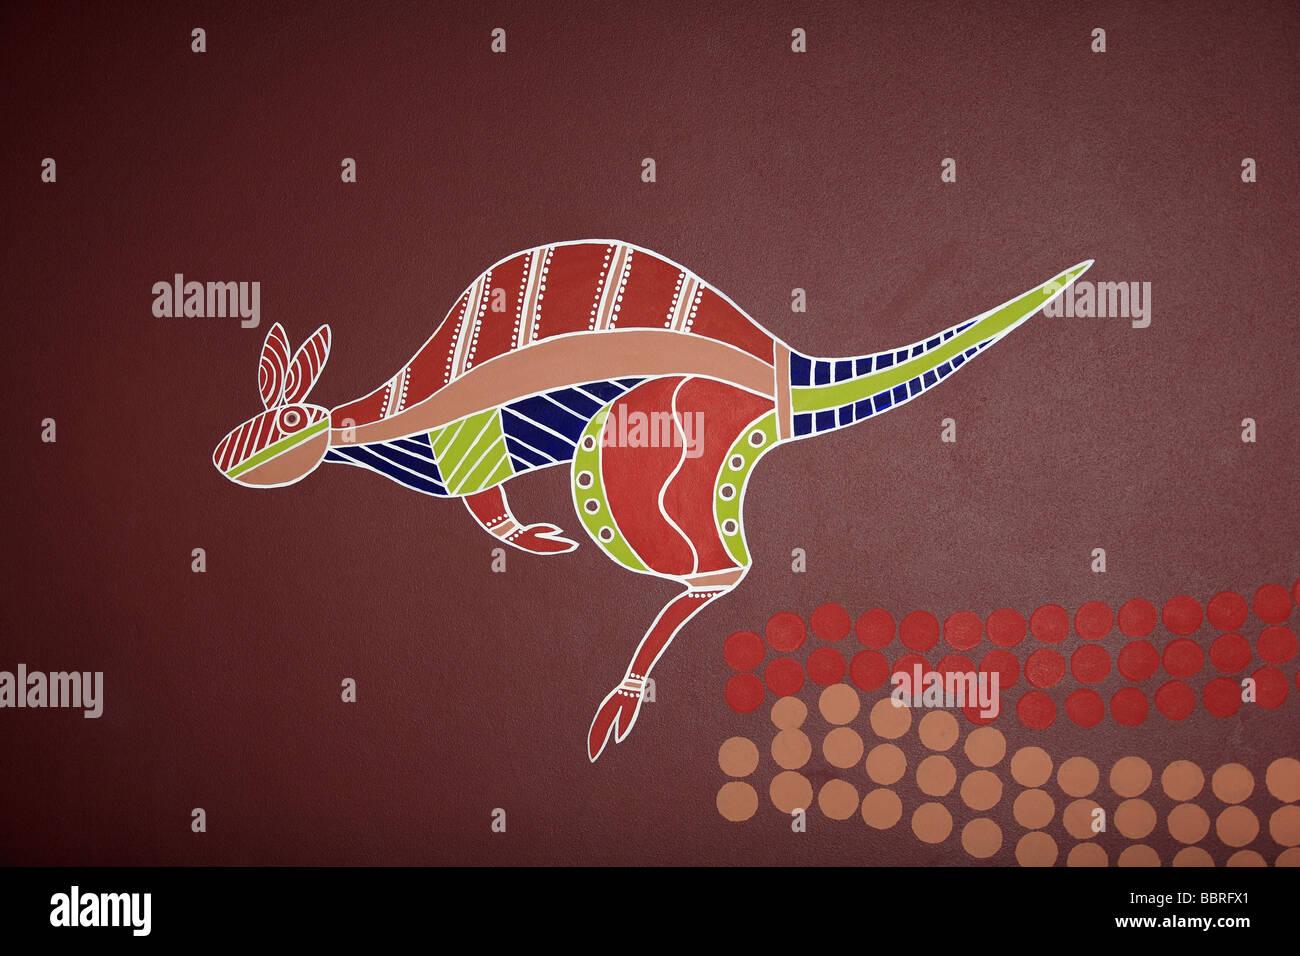 aboriginal-style-artwork-of-a-kangaroo-painted-on-a-wall-BBRFX1.jpg